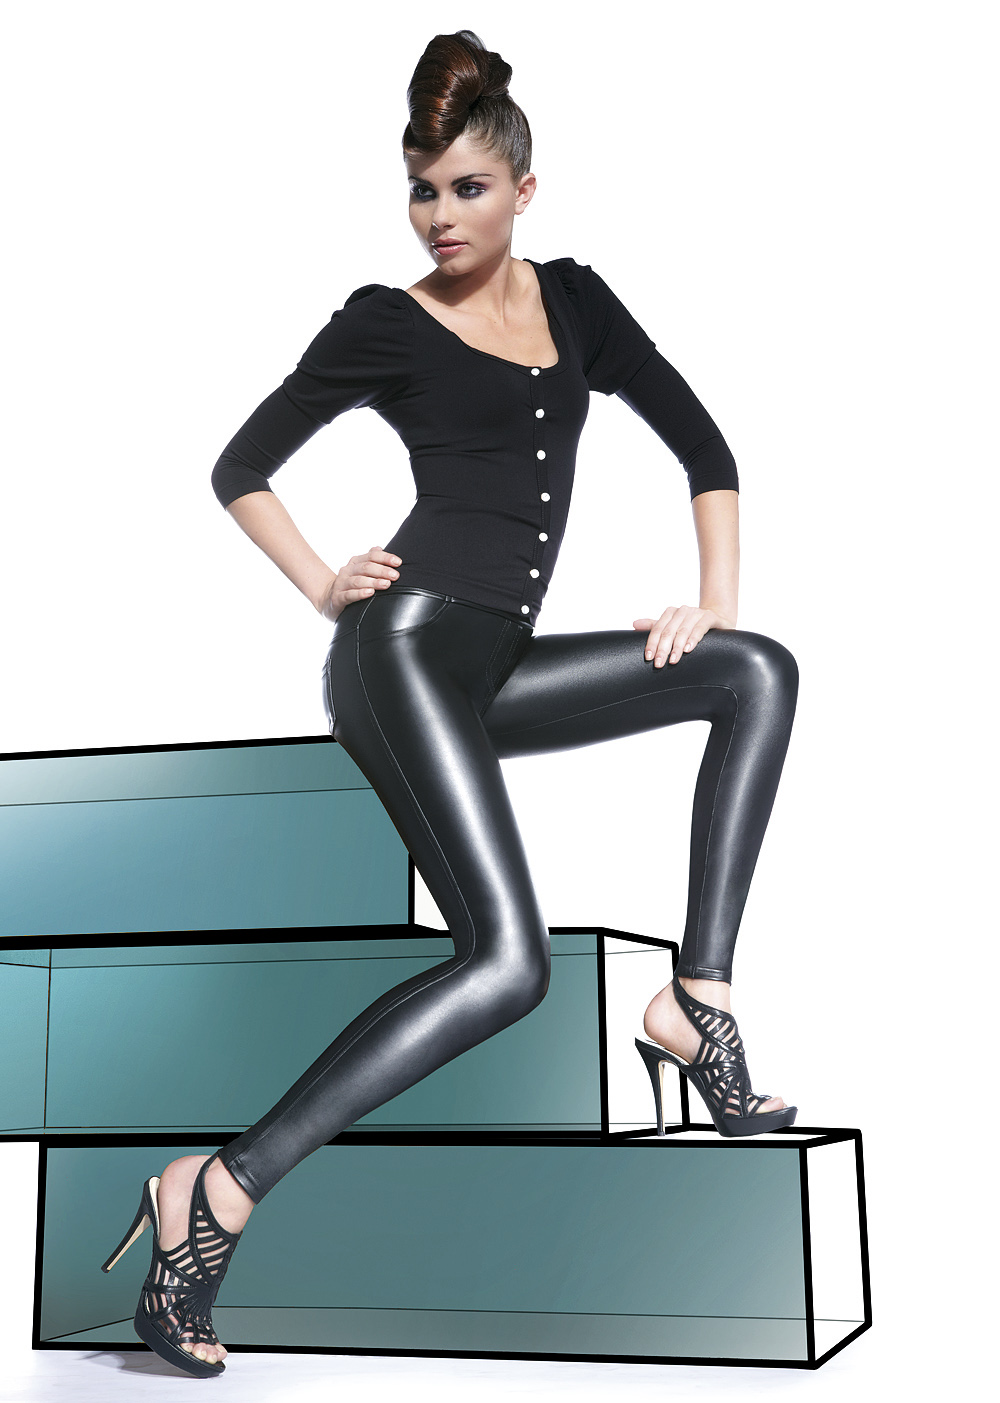 Legíny Vanessa - Bas Bleu barva: černá, velikost: L